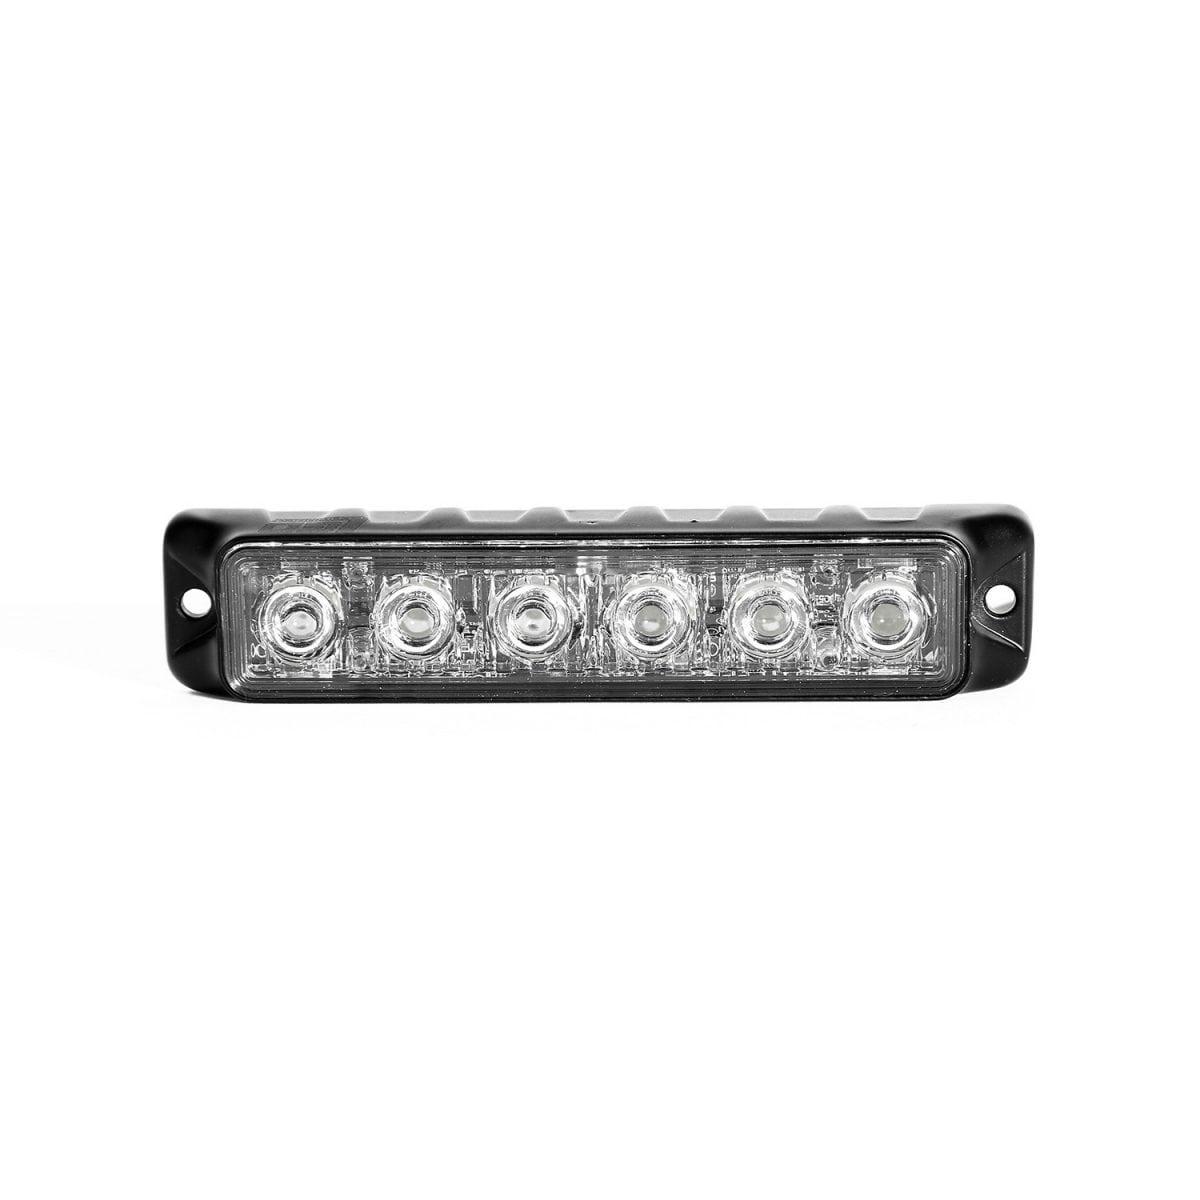 Swift 30 Tir 3 Watt 6 Led Emergency Vehicle Grill Warning Light Lighting Wiring Diagram Besides Car Electrical Head Equipped